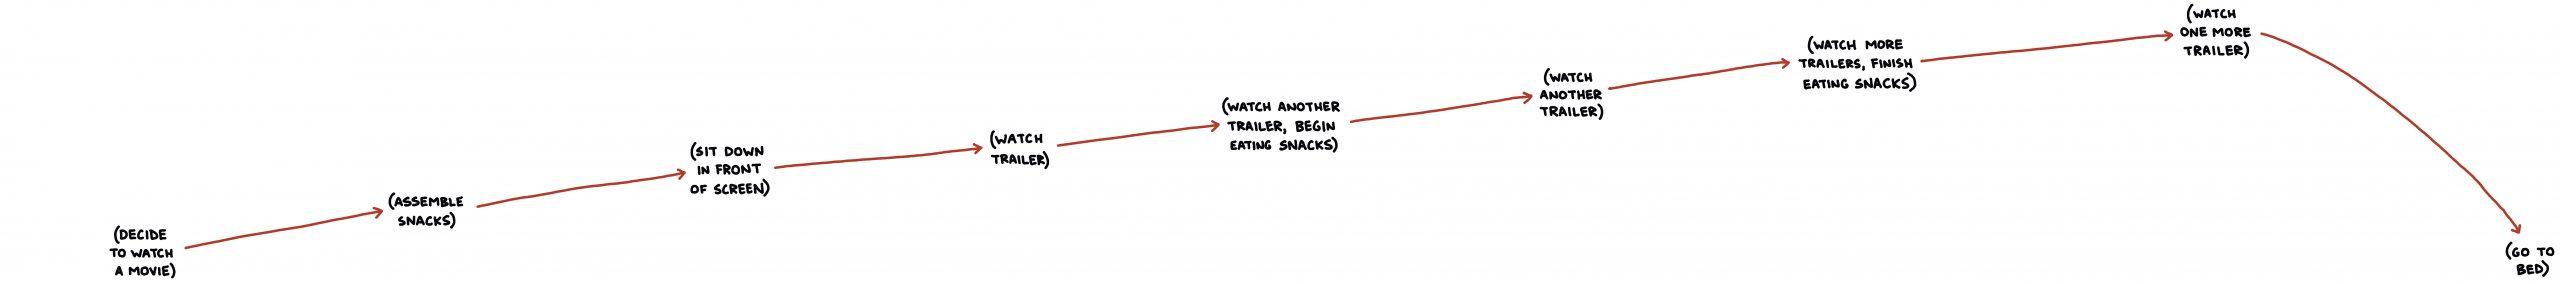 Watching Movie Trailers